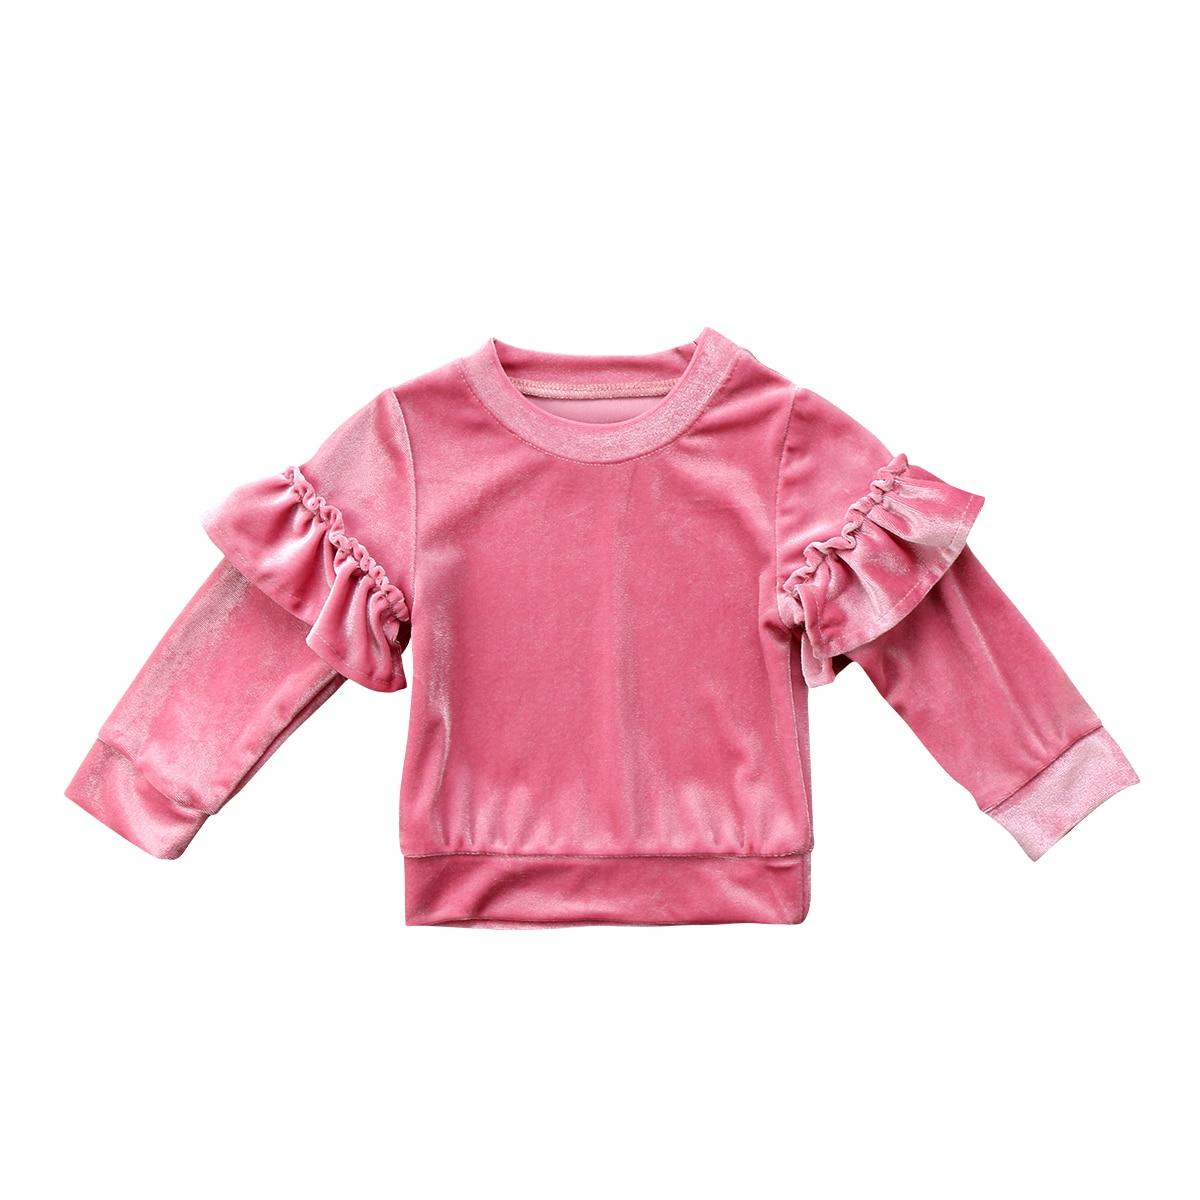 Kid Baby Girls Clothes Children Kids Velvet Ruffle Long Sleeves T-shirts For Gilrs Fleece Tops Jumper Fashion Girls clothing